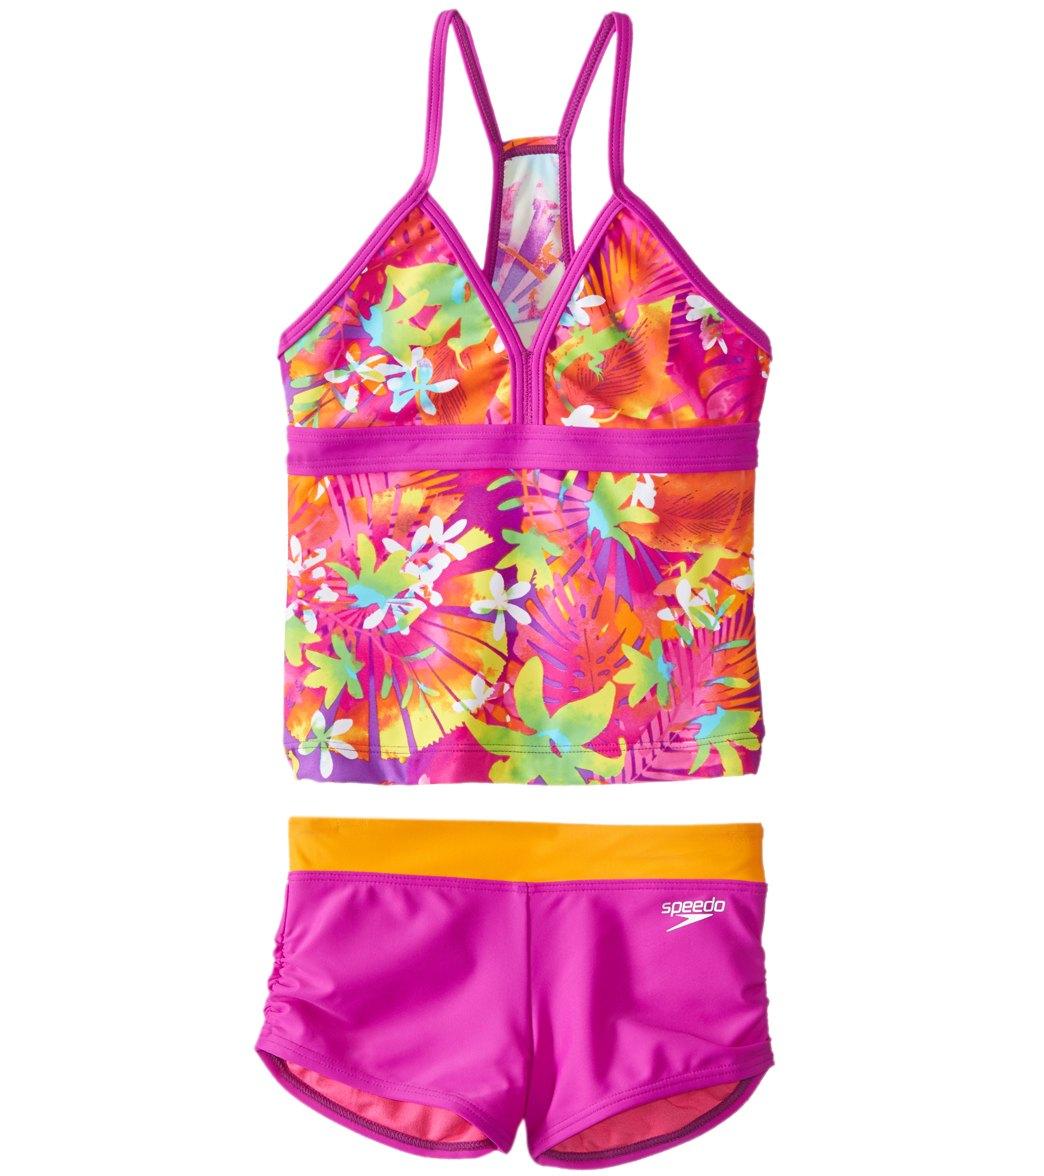 778777081a Speedo Girls  Jungle Floral Two Piece Boyshort Tankini Set (7-16) at  SwimOutlet.com